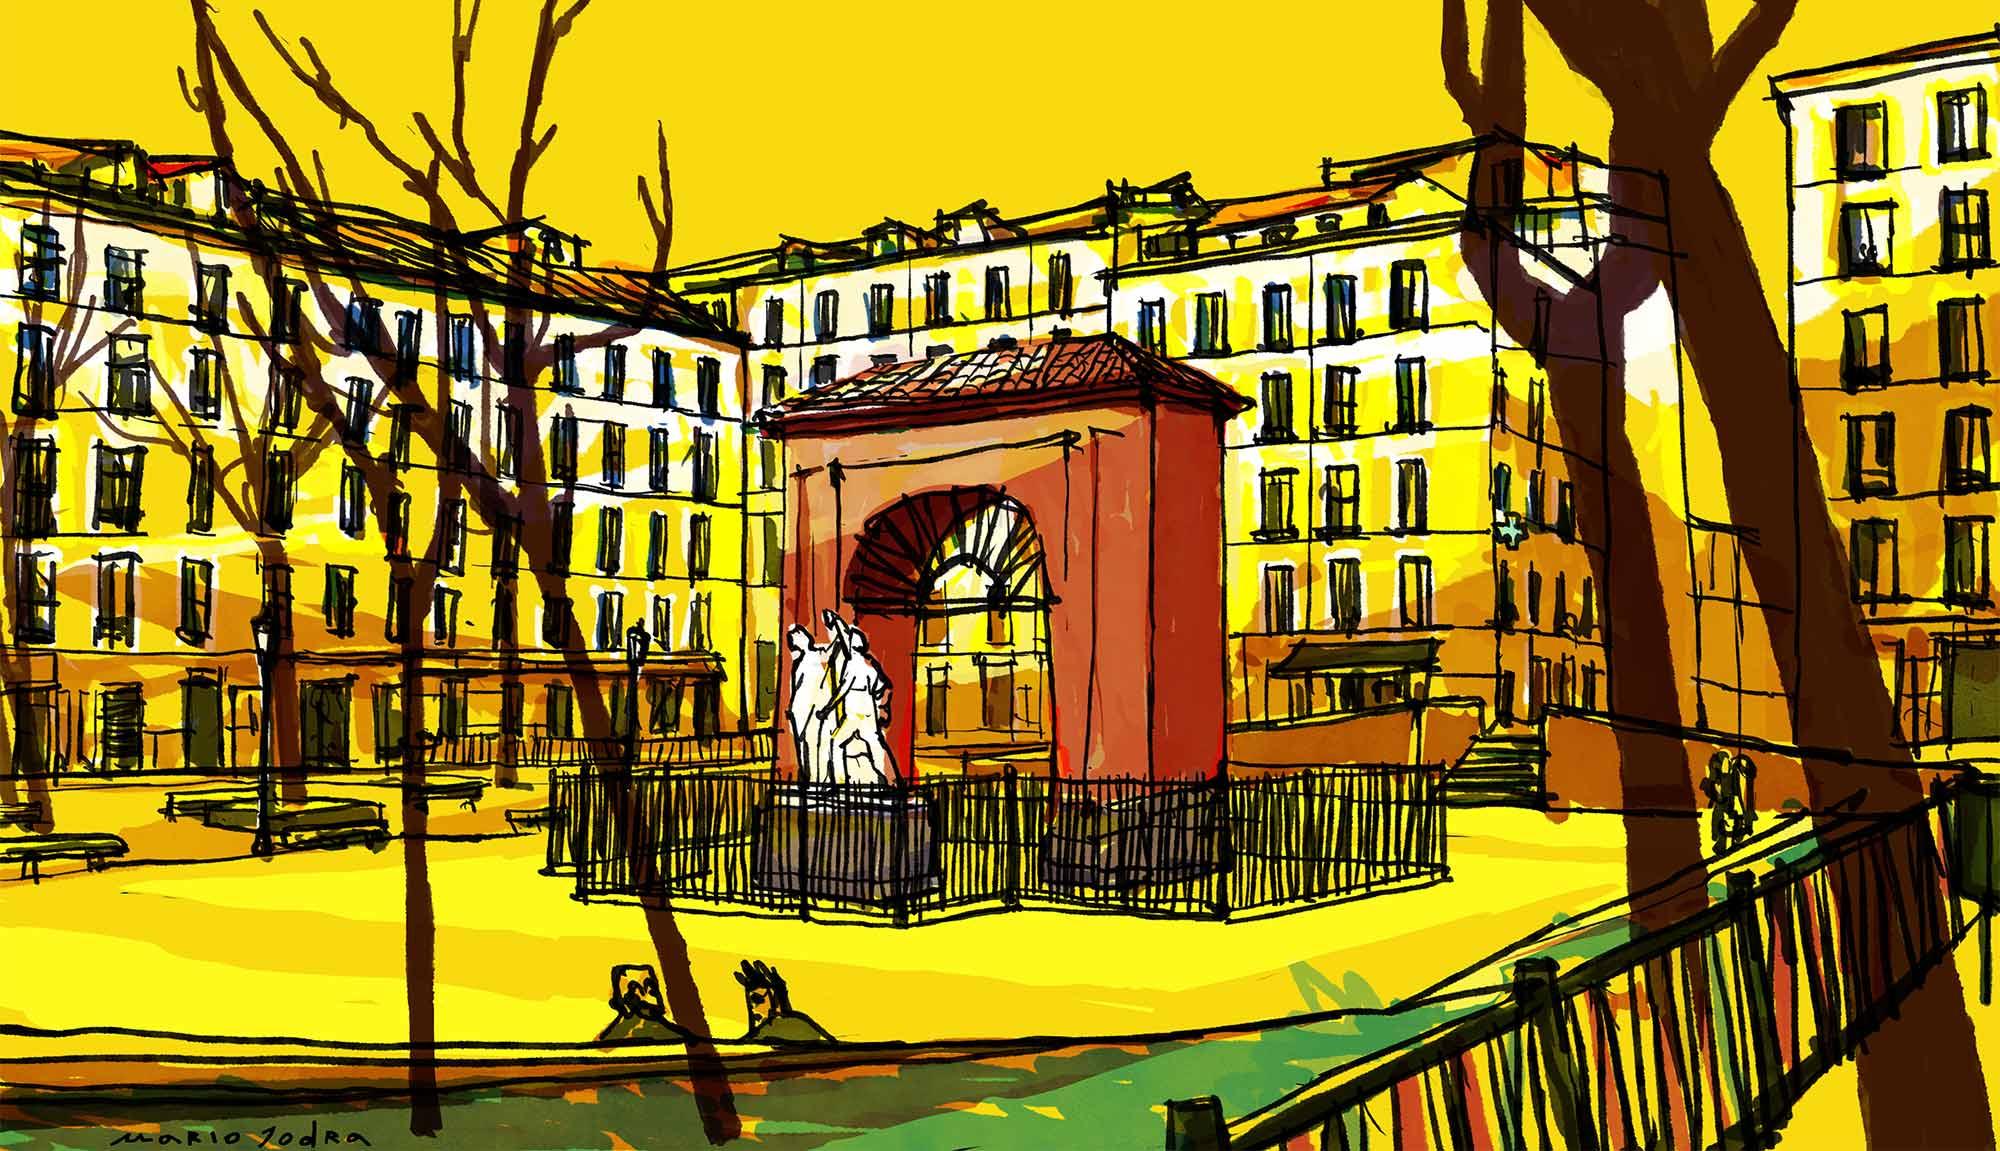 Mario Jodra illustration - Plaza del Dos de Mayo, Madrid.